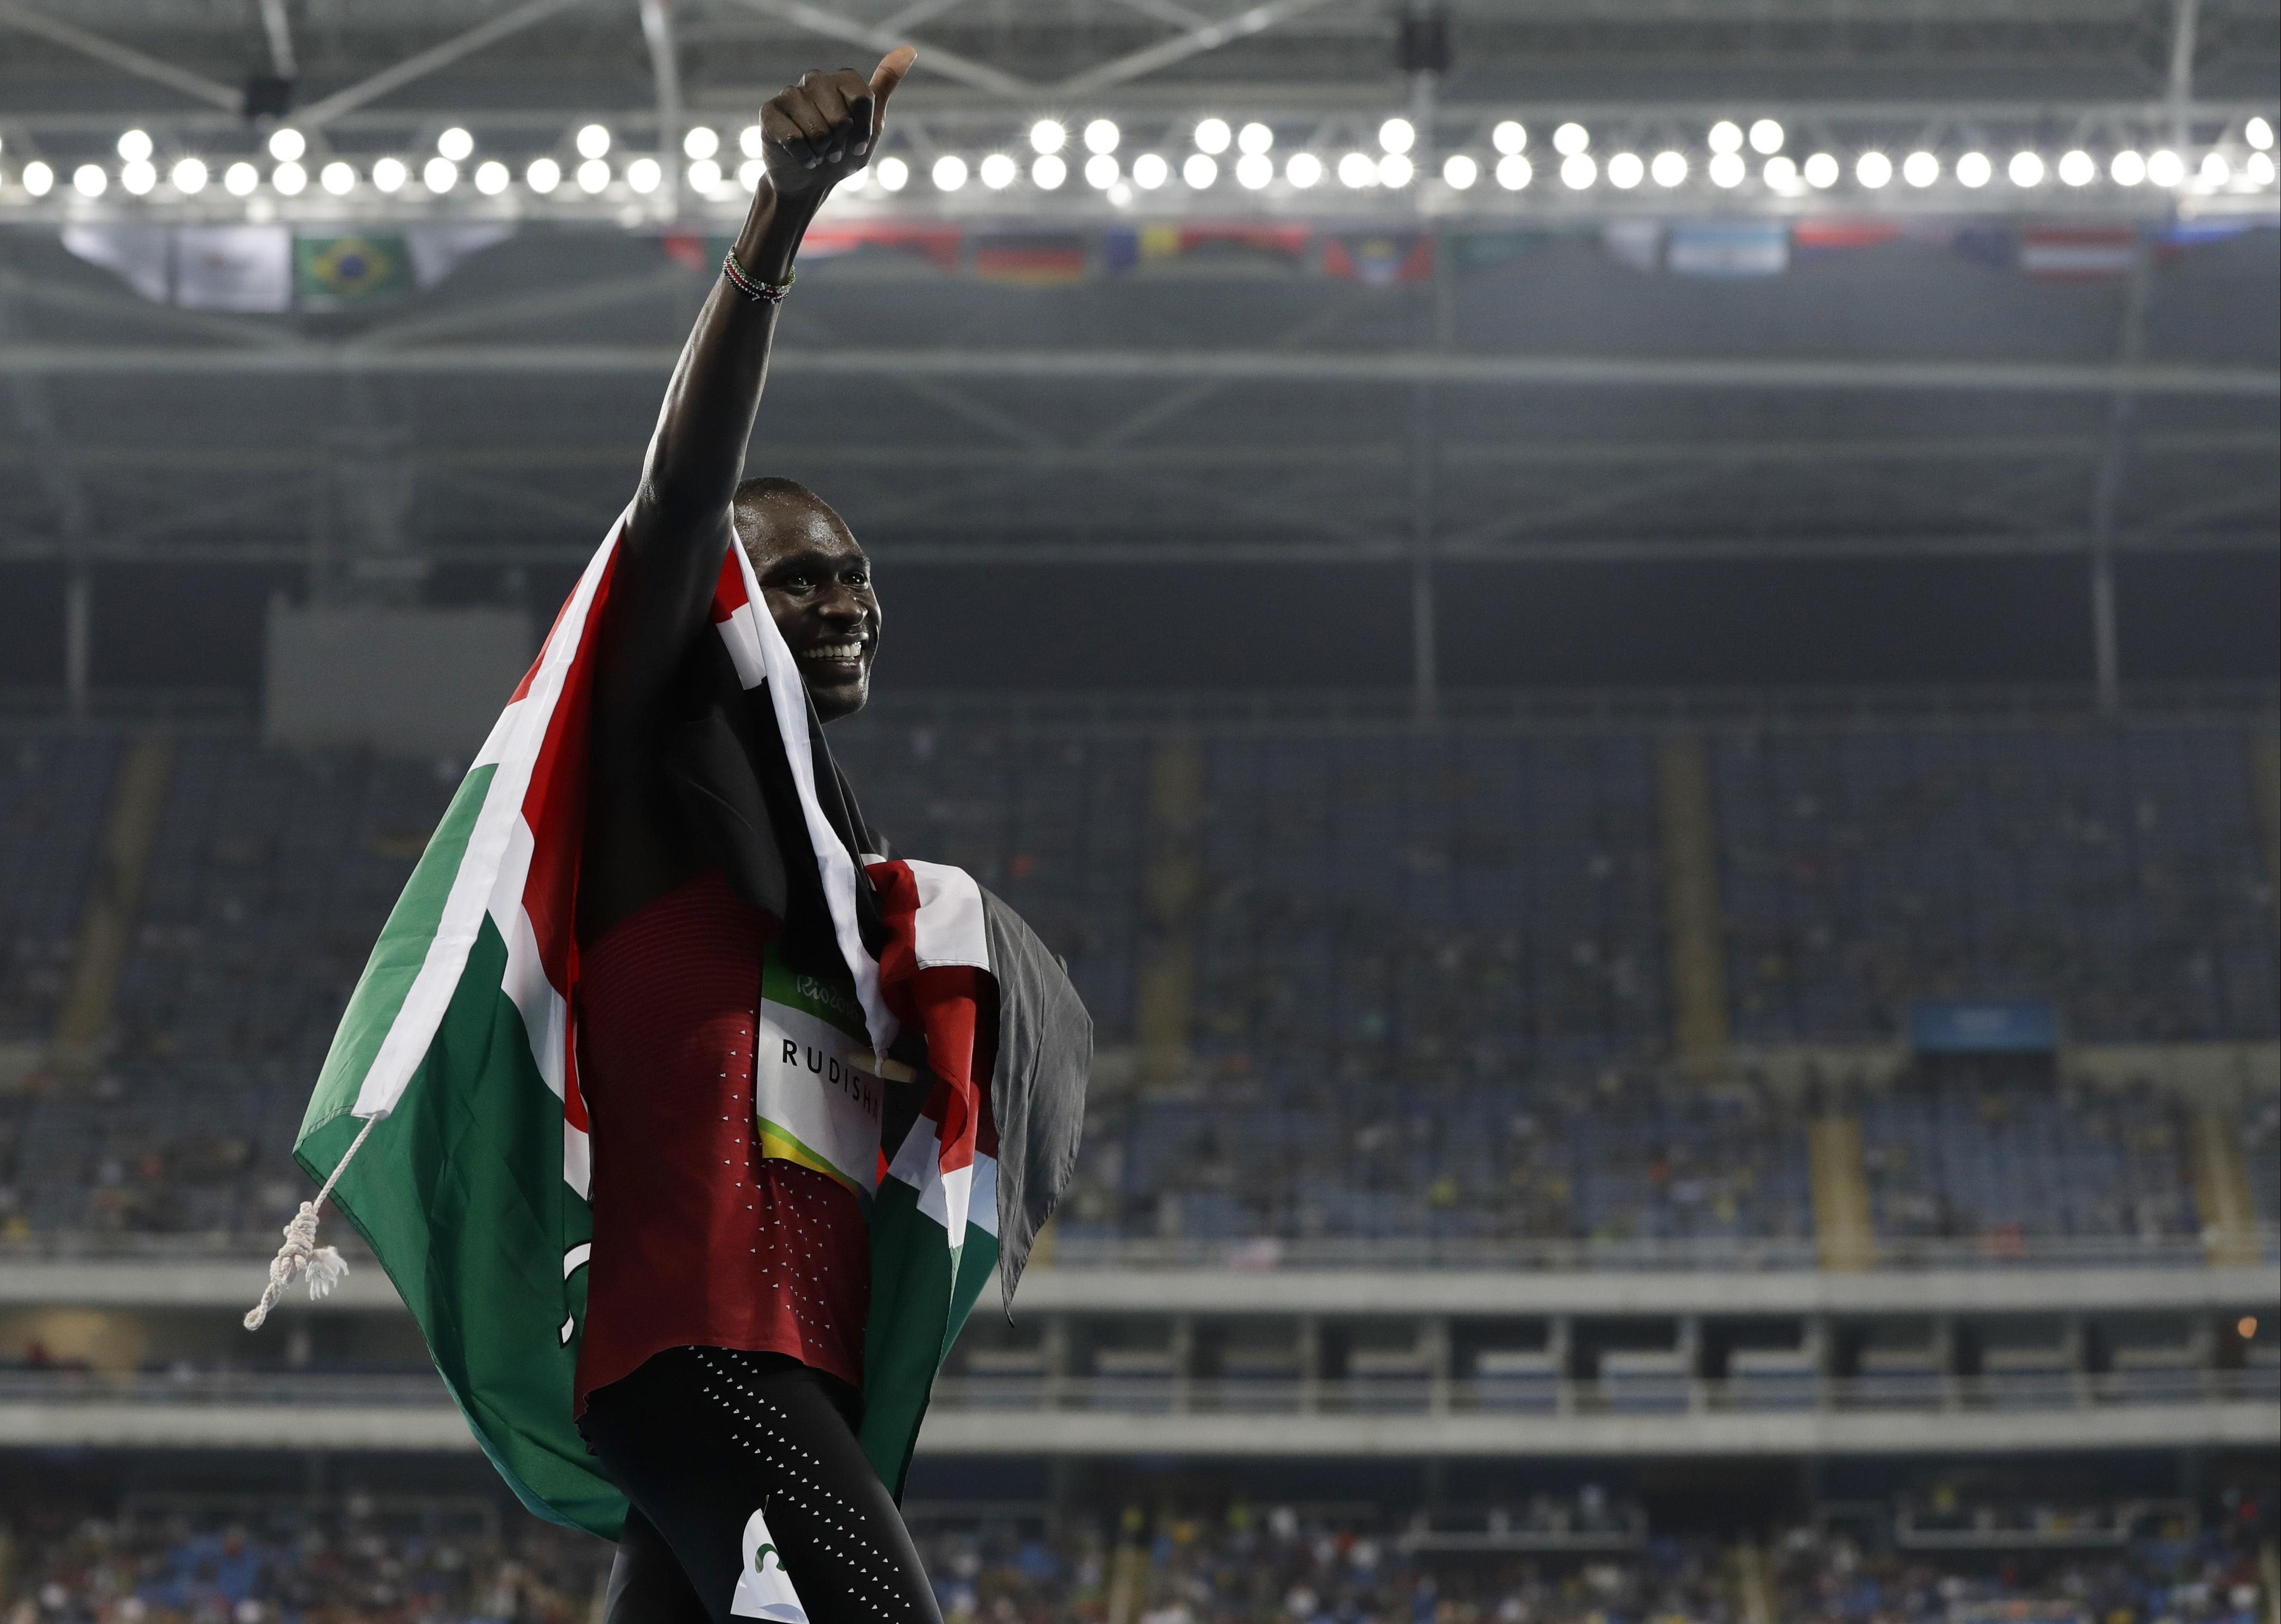 FILE - In this Monday, Aug. 15, 2016 file photo, Kenya's David Lekuta Rudisha celebrates winning the men's 800-meter final during the athletics competitions of the 2016 Summer Olympics at the Olympic stadium in Rio de Janeiro, Brazil. David Rudisha has wi